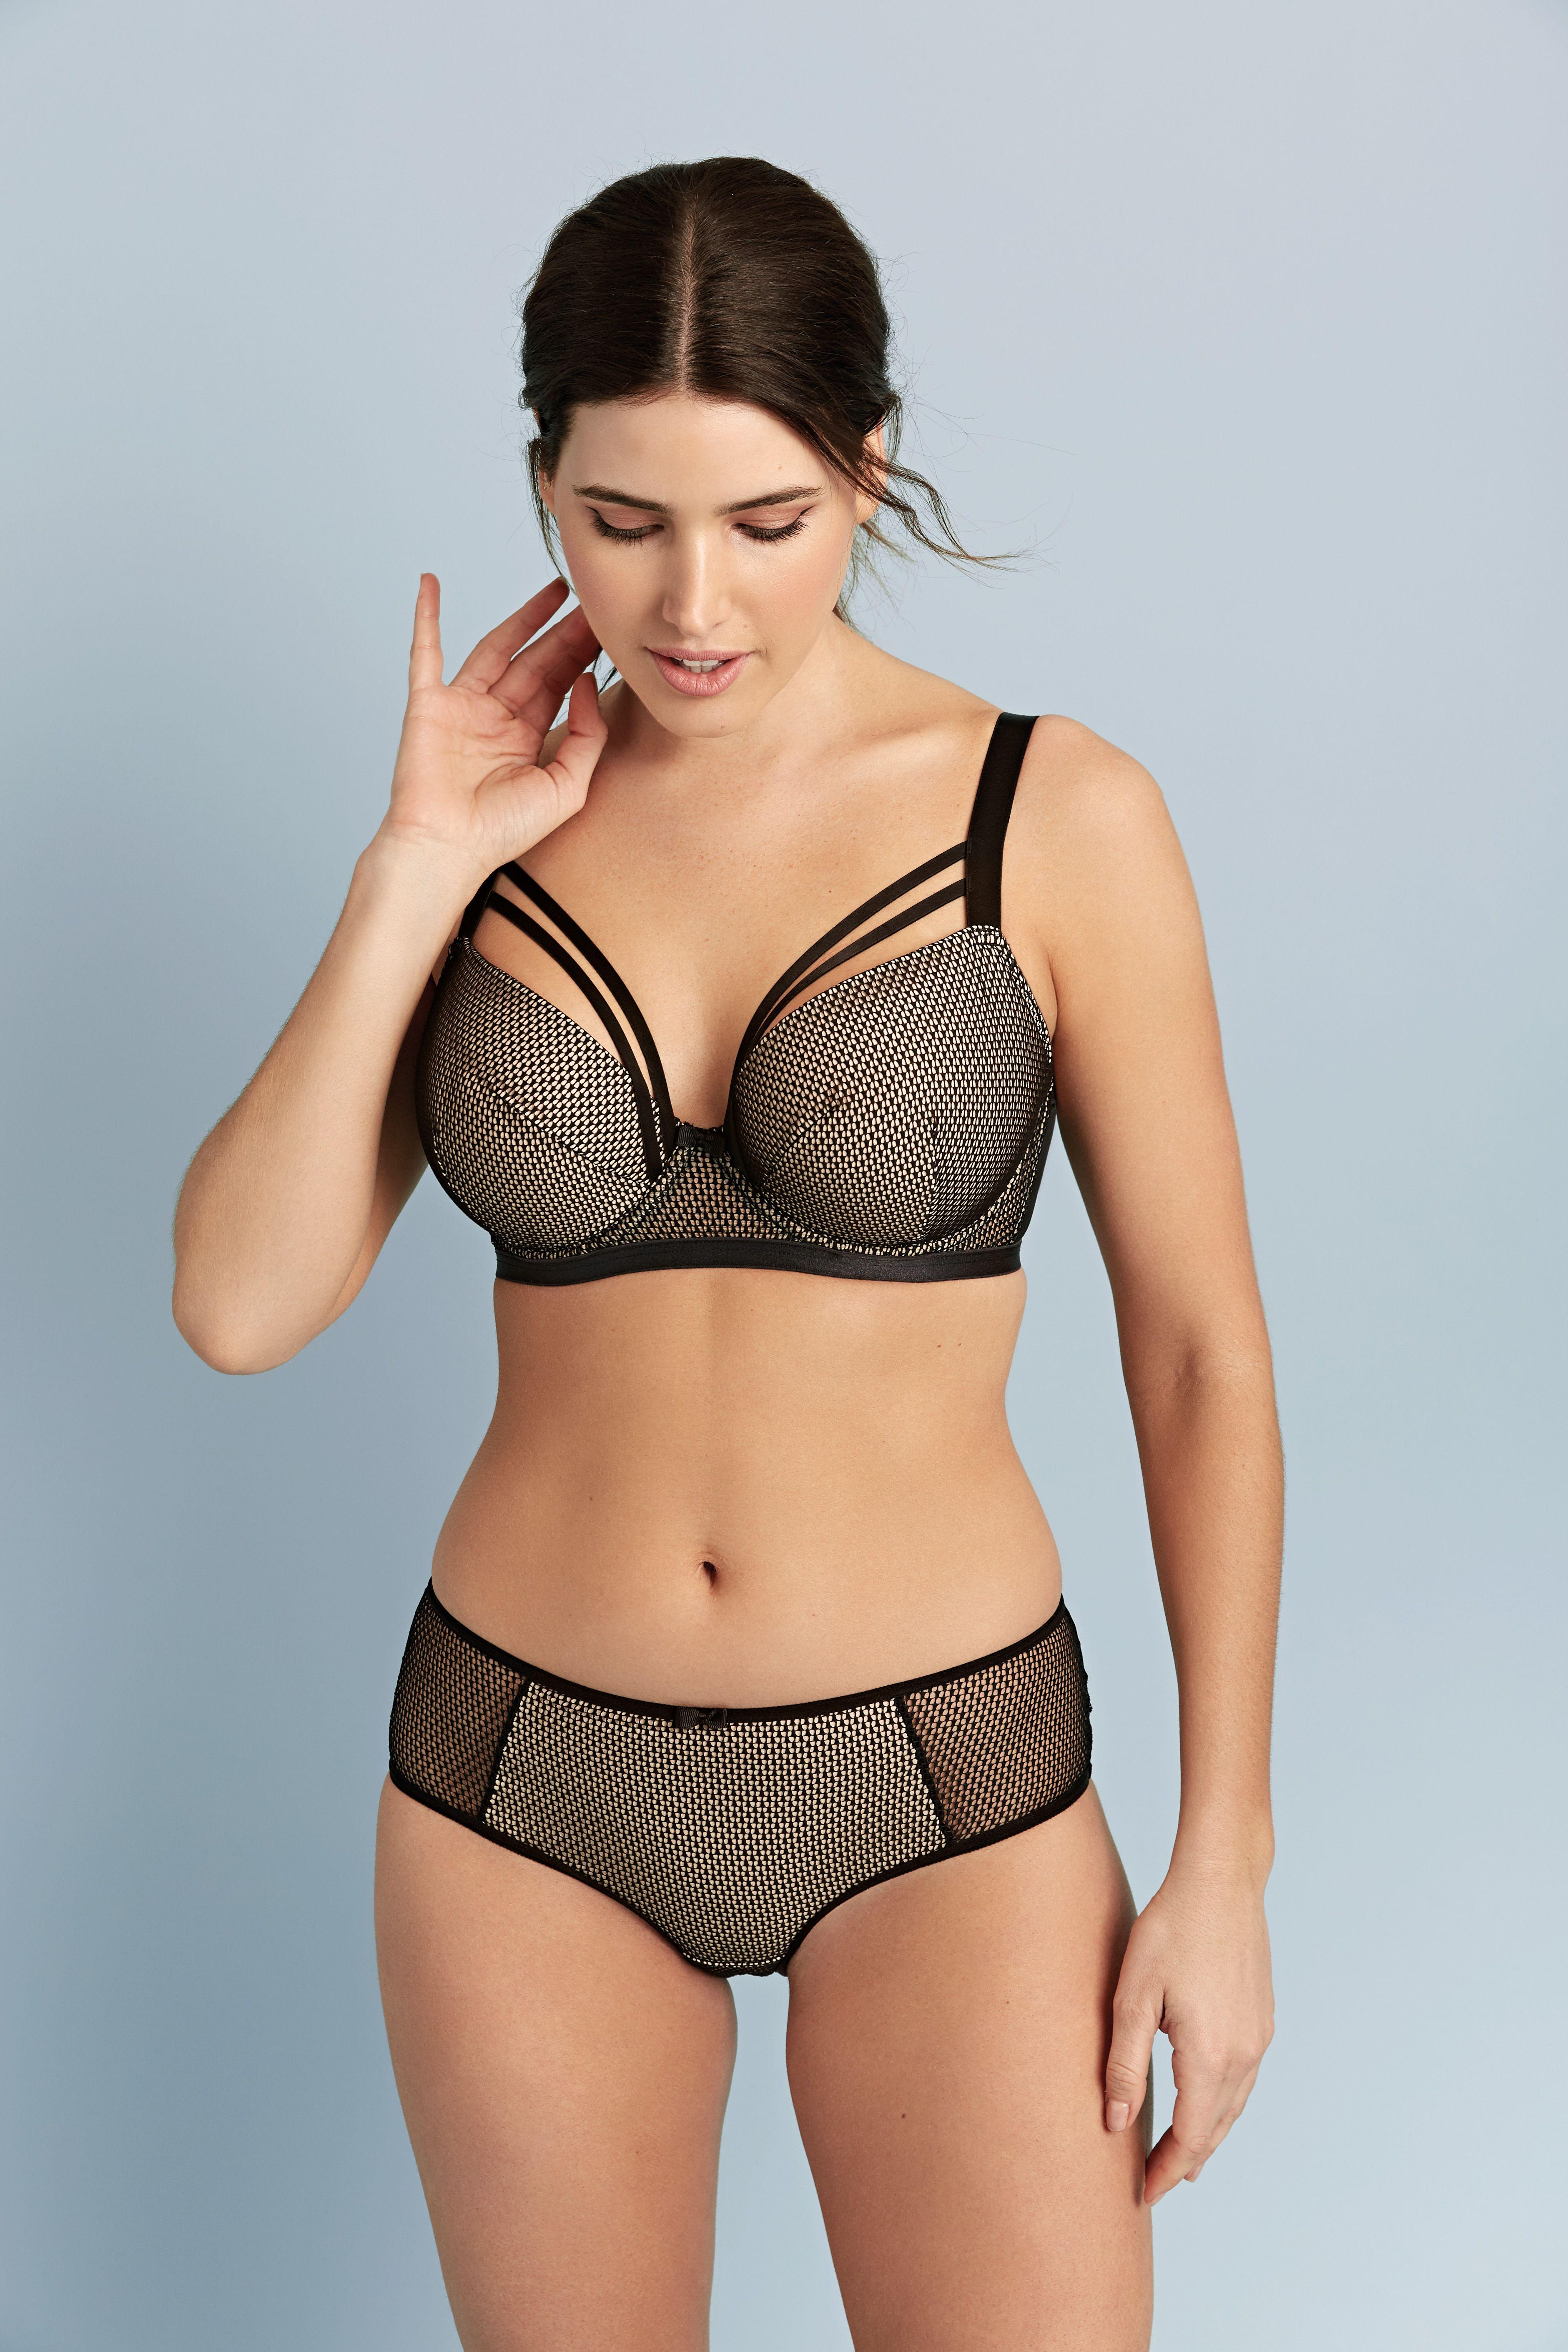 4511d1575ad3 Jinx bra (by Curvy Kate) Lingerie Styles, Lingerie Sets, Bravissimo, Plunge